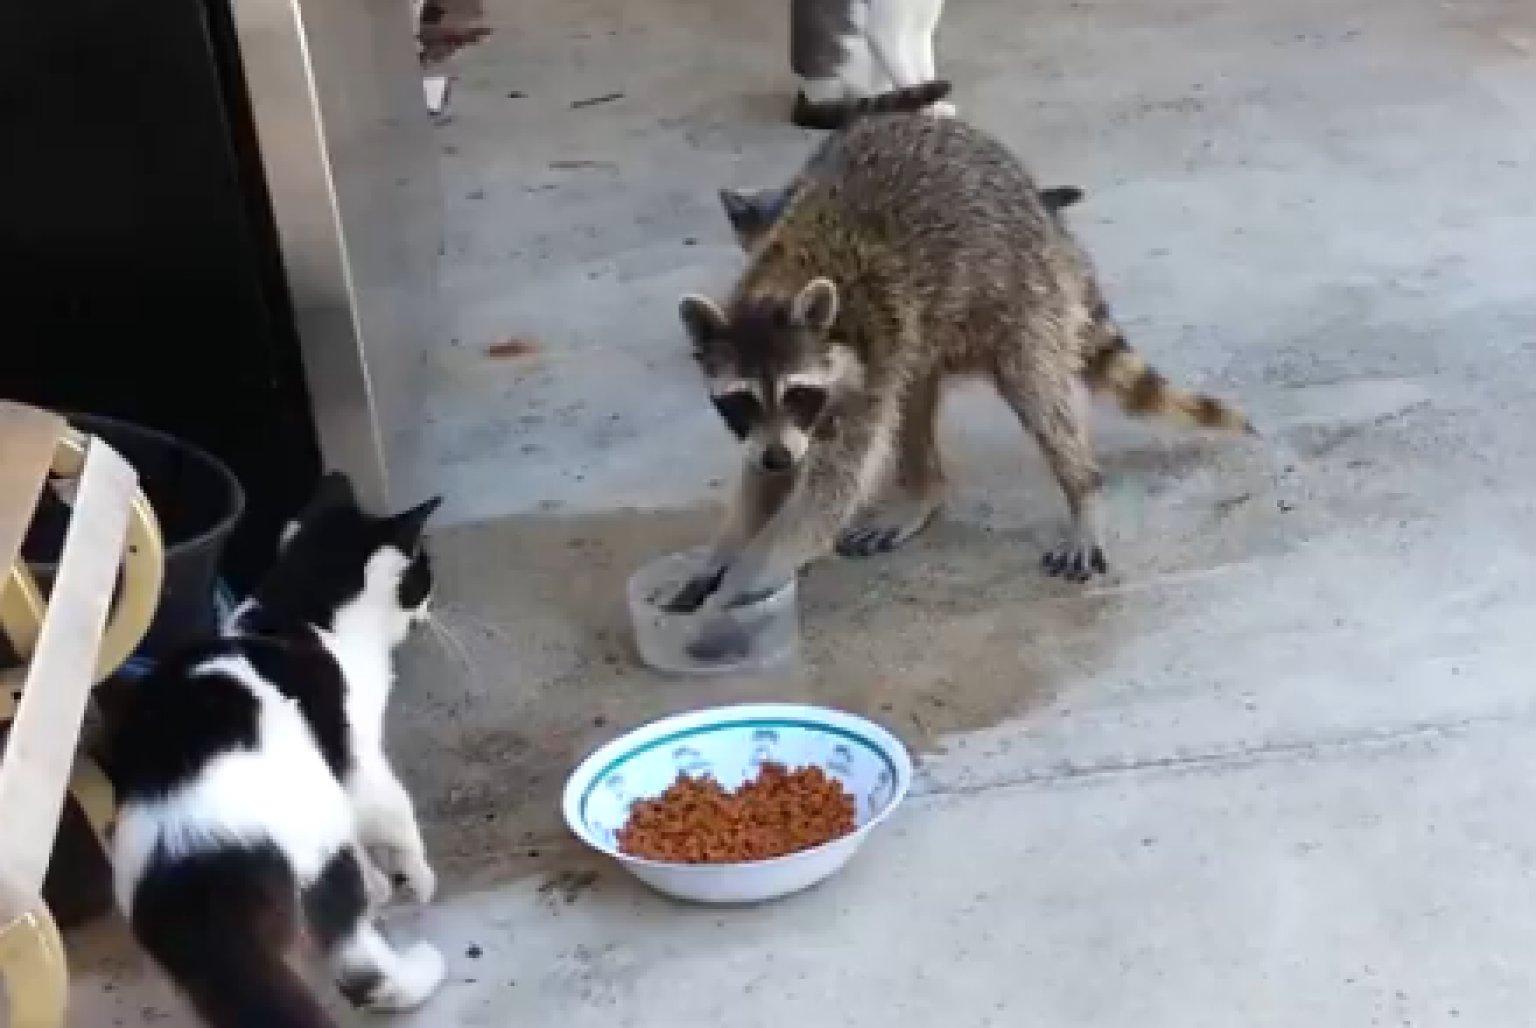 Funny Raccoon Video Stealing Cat Food